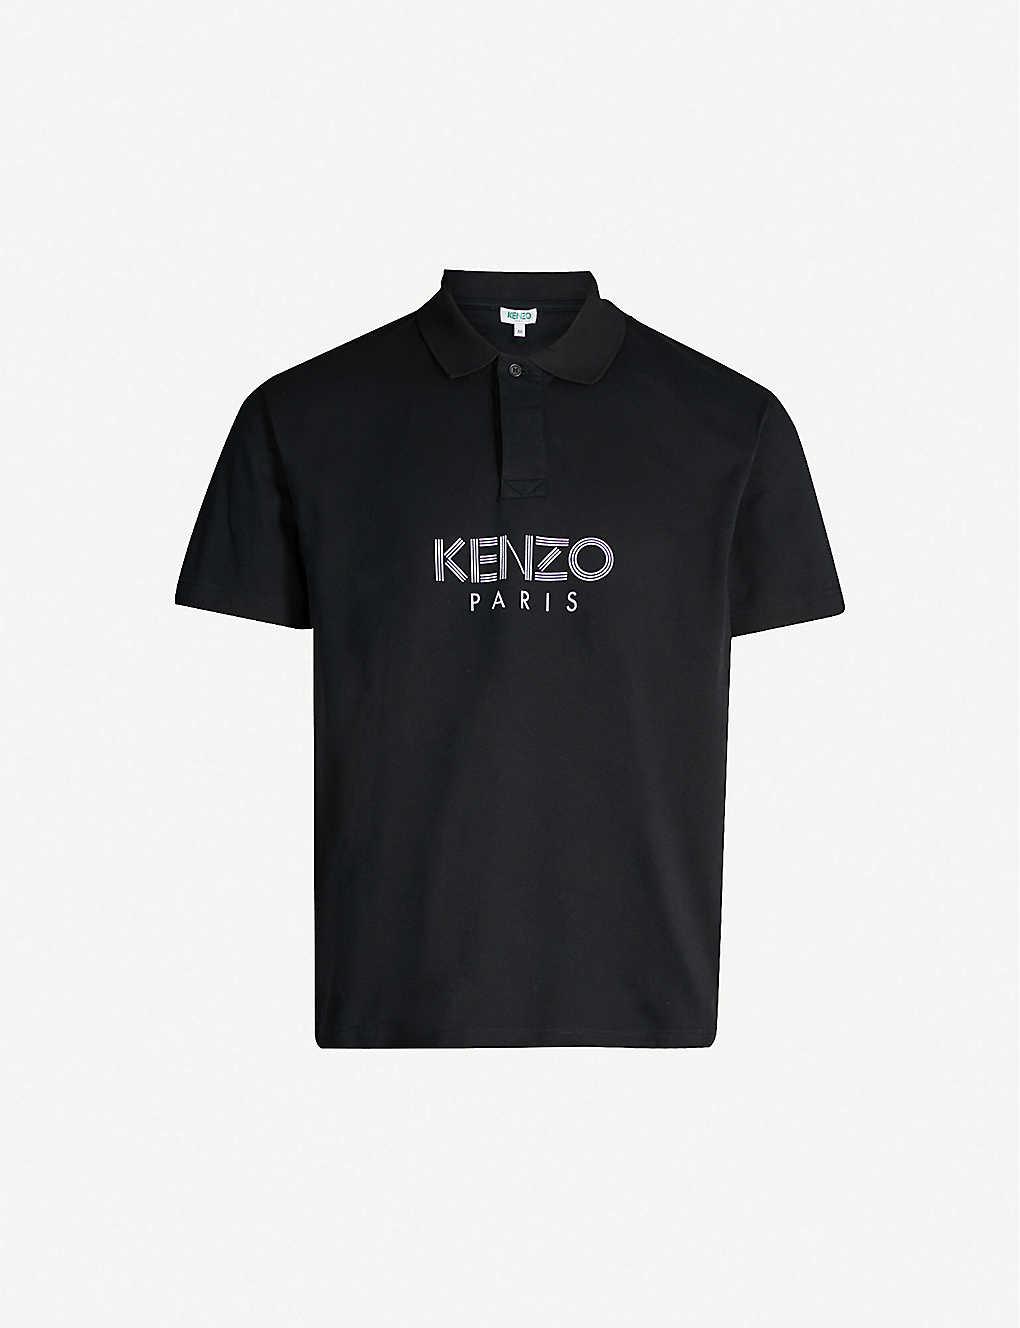 01408a72772 KENZO - Branded logo cotton-piqué polo shirt | Selfridges.com